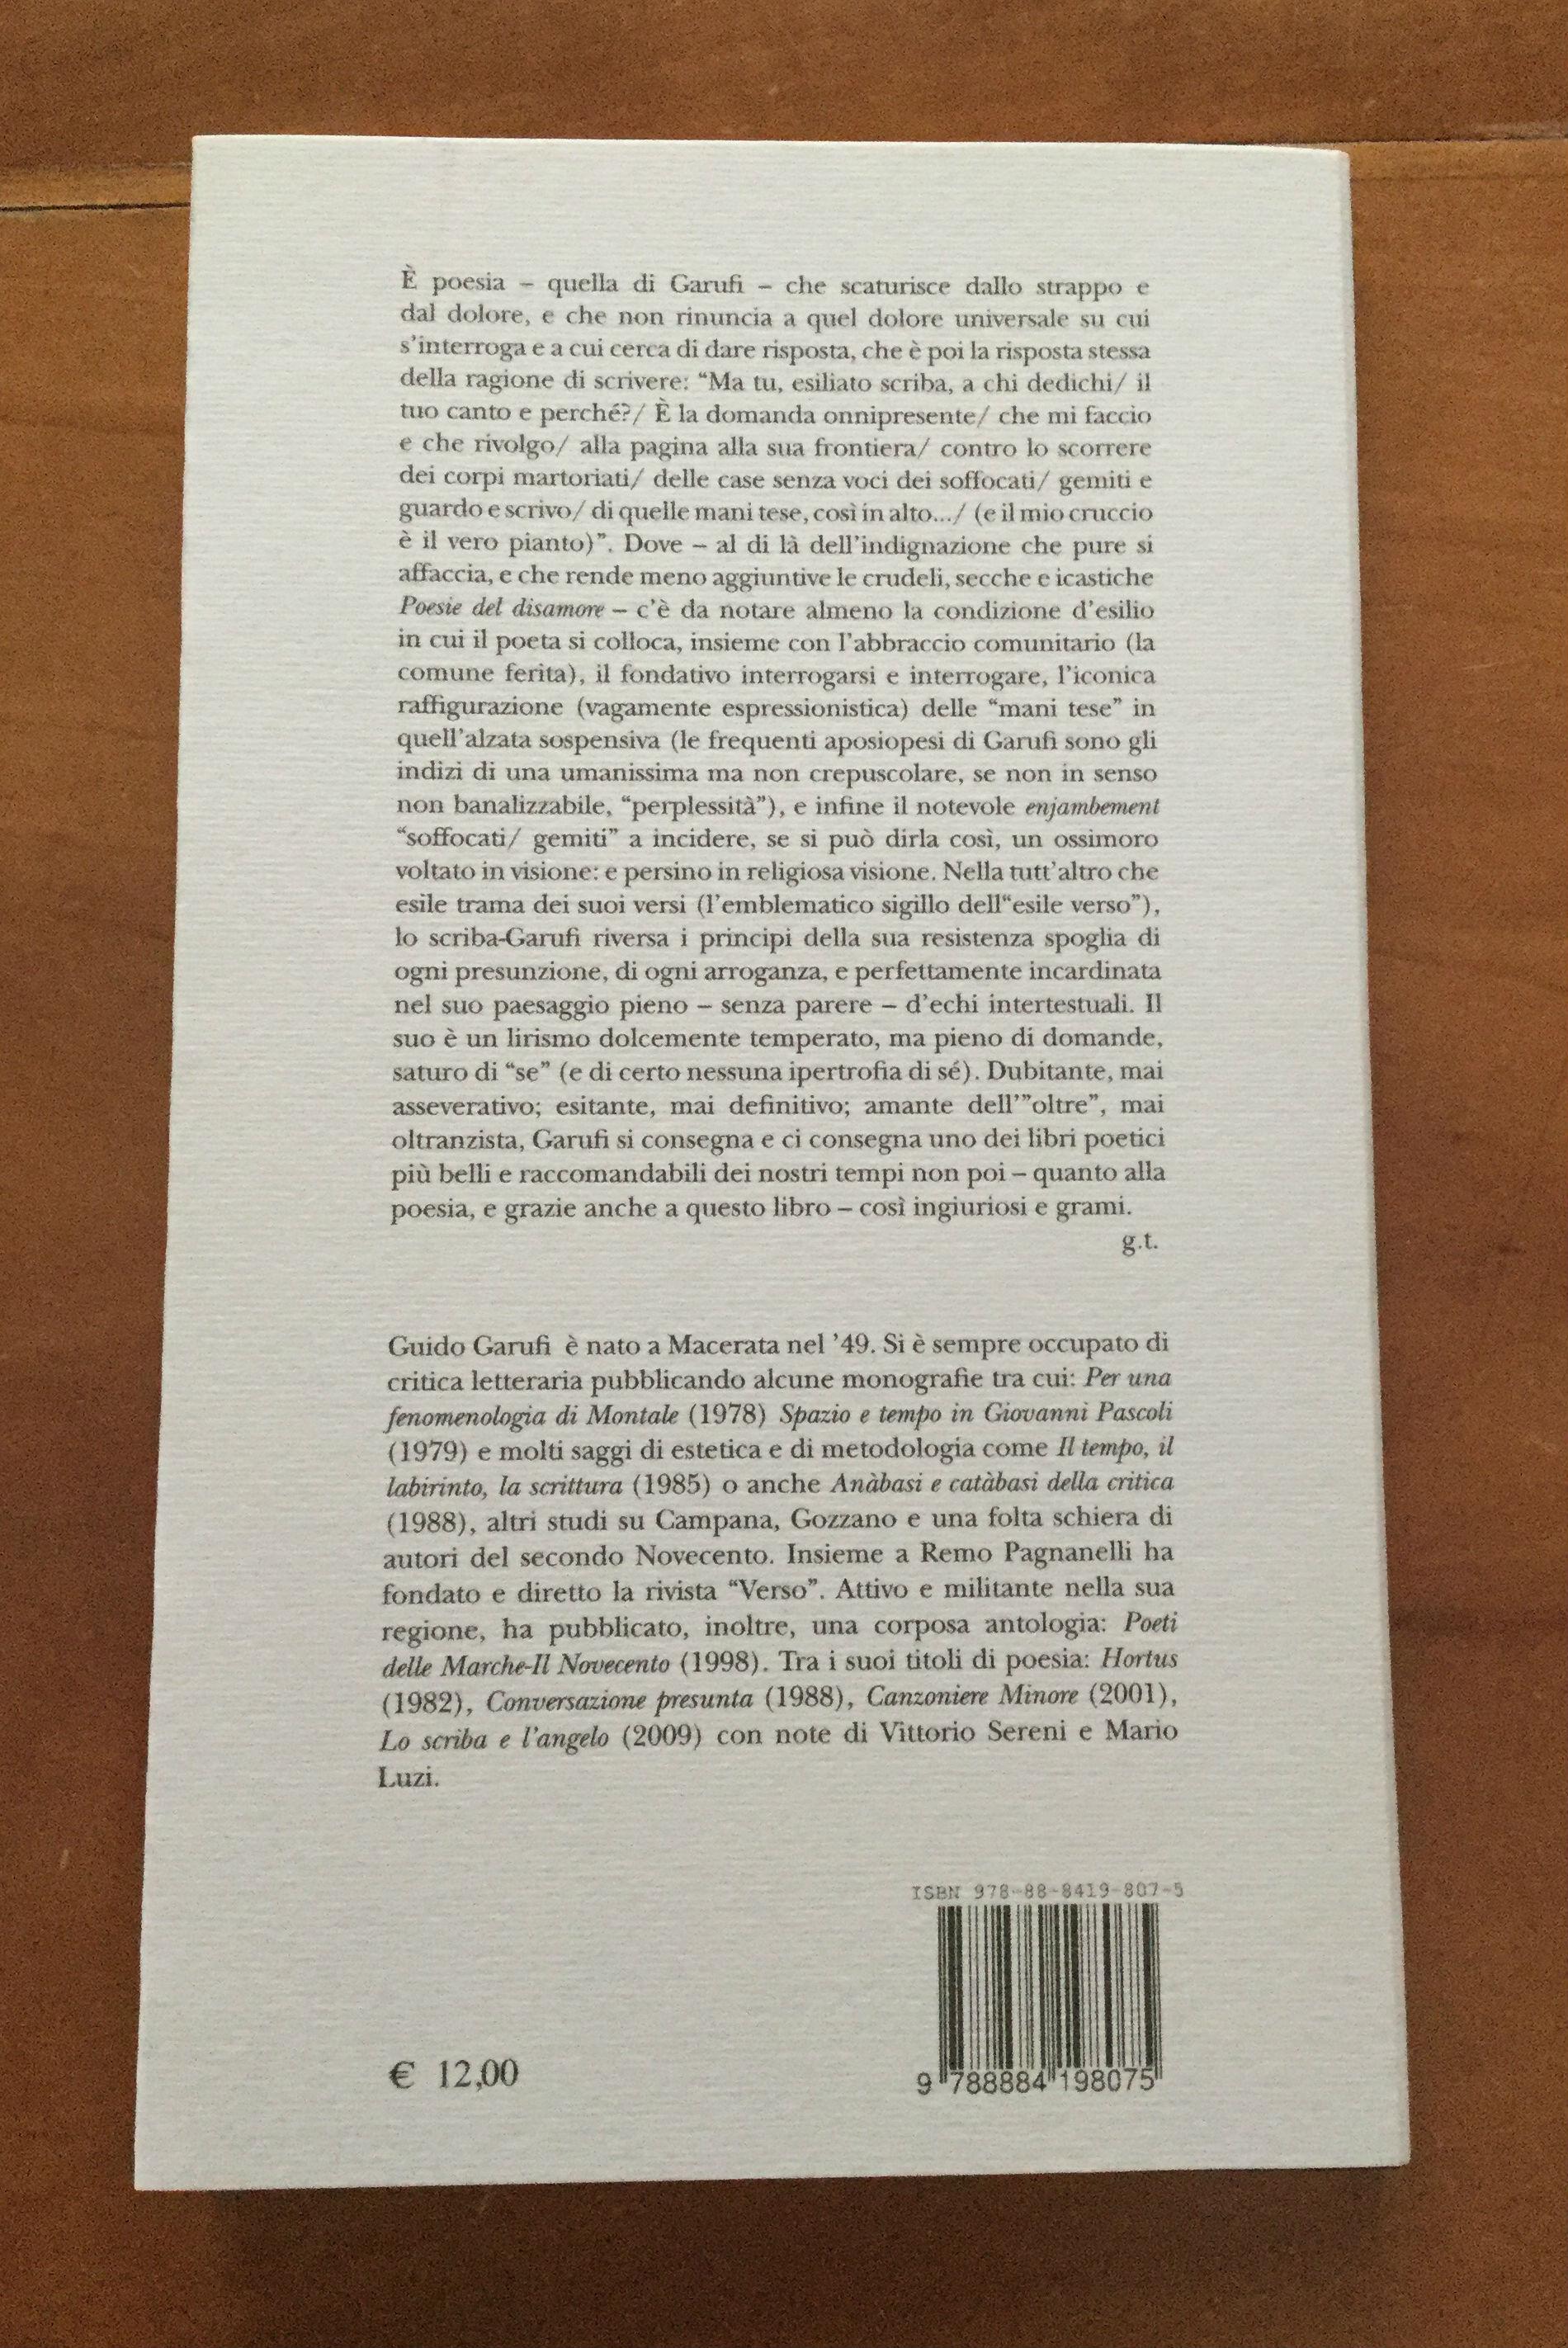 Fabia Ghenzovich Poesia Inedita Nudità Premessa Di Ranieri Teti